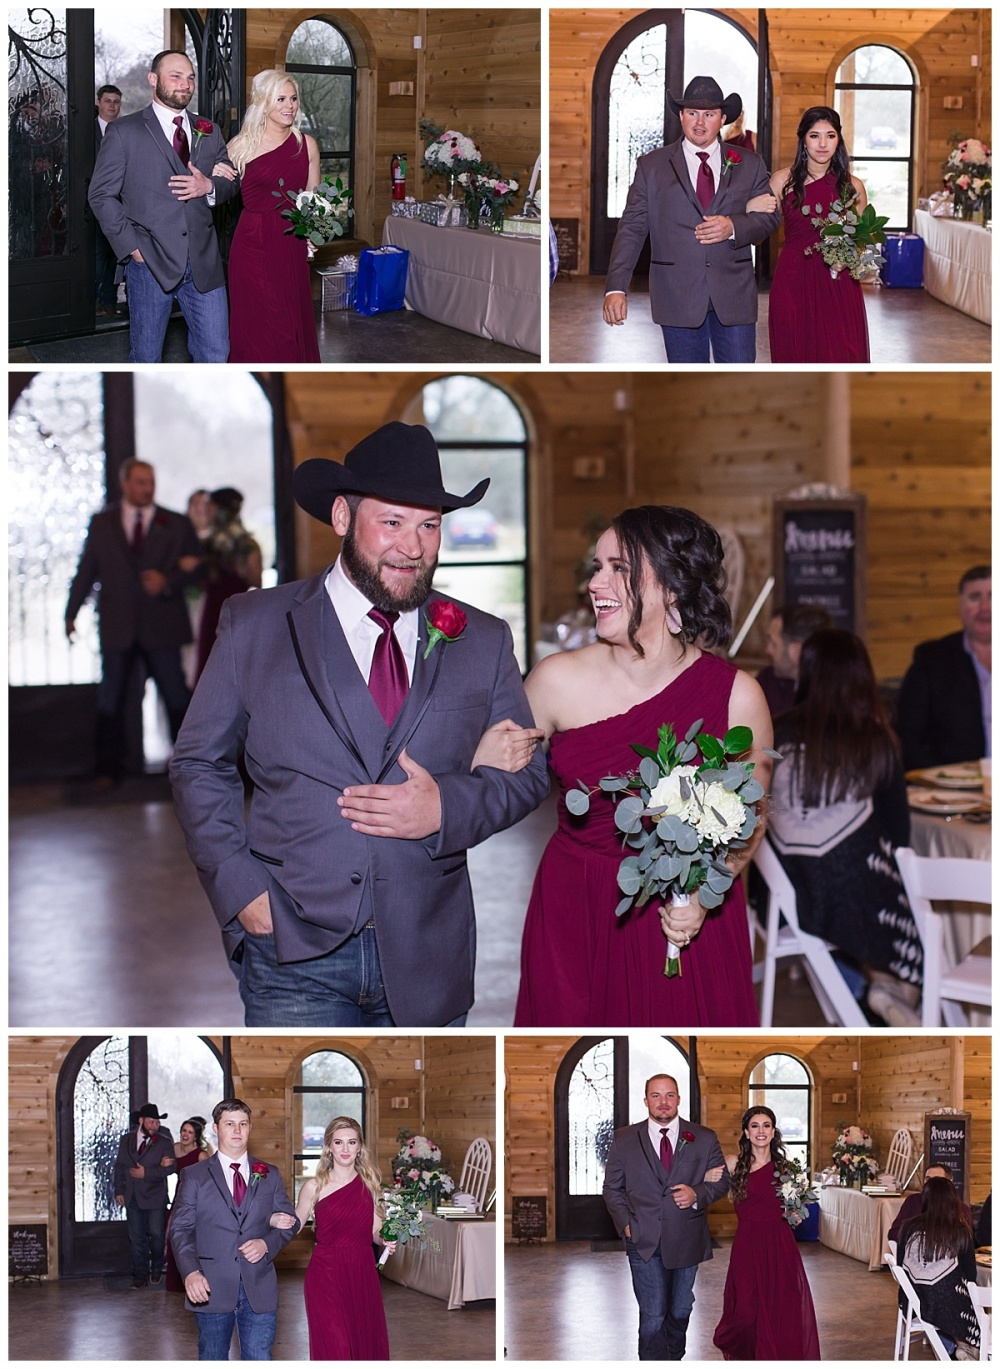 Carly-Barton-Photography-Geronimo-Oaks-Wedding-Venue-Texas-Hill-Country-Ronnie-Sarah_0111.jpg